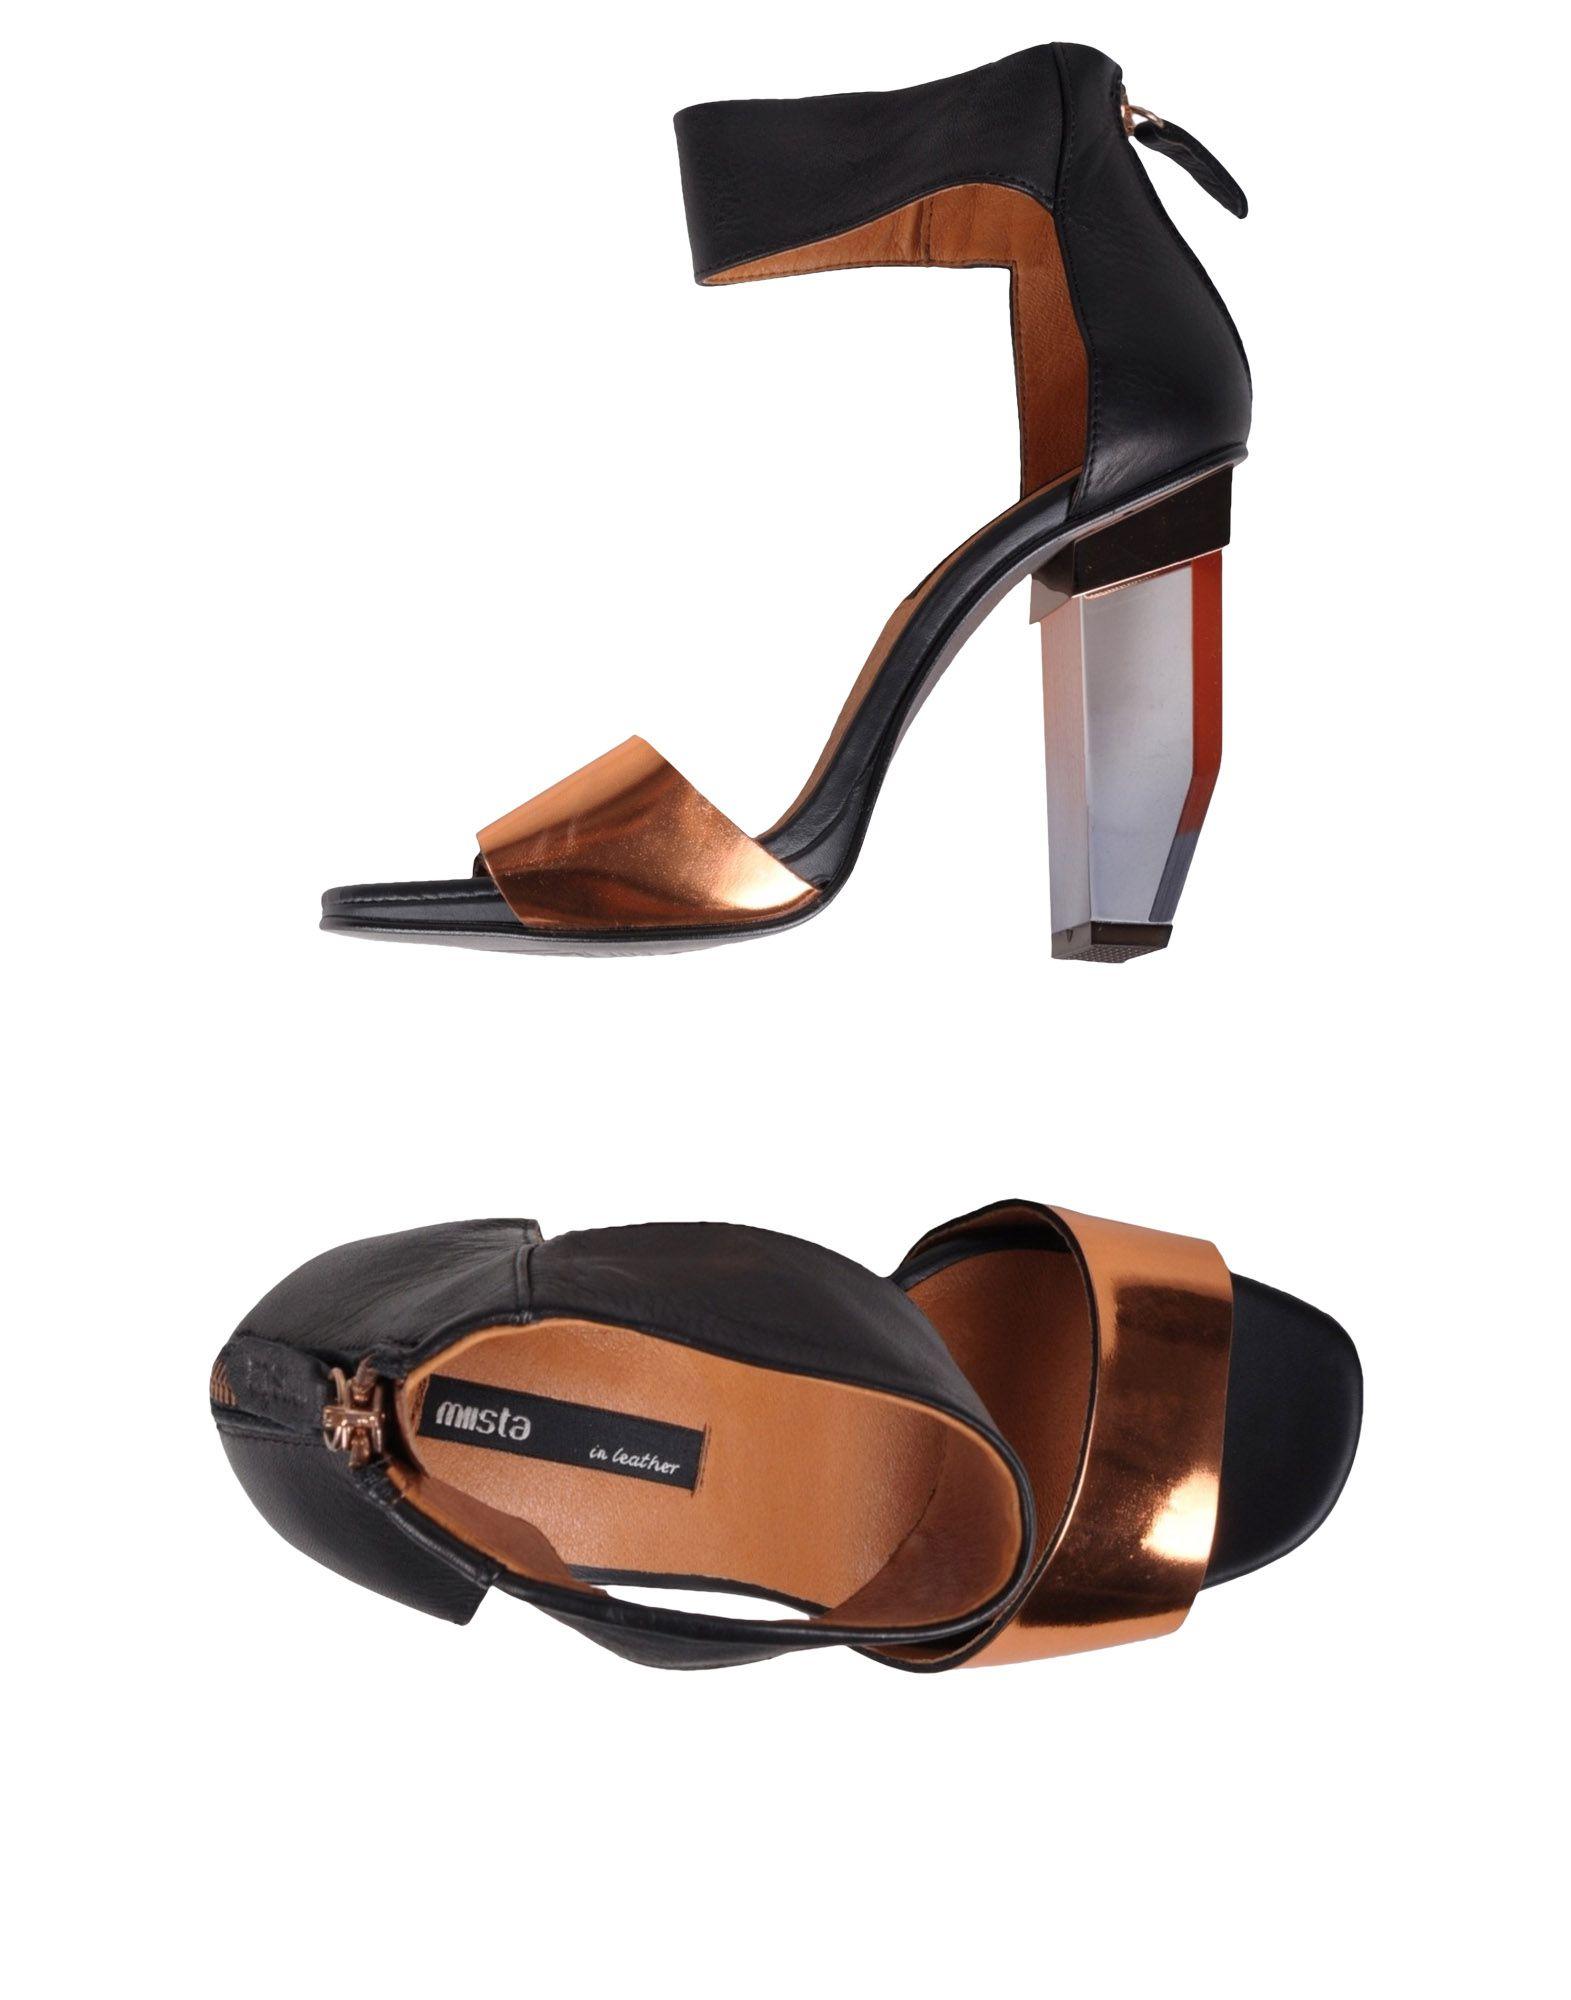 miista sandales - femmes miista sandales en en en ligne sur l'australie - 44850286xl ae3f71